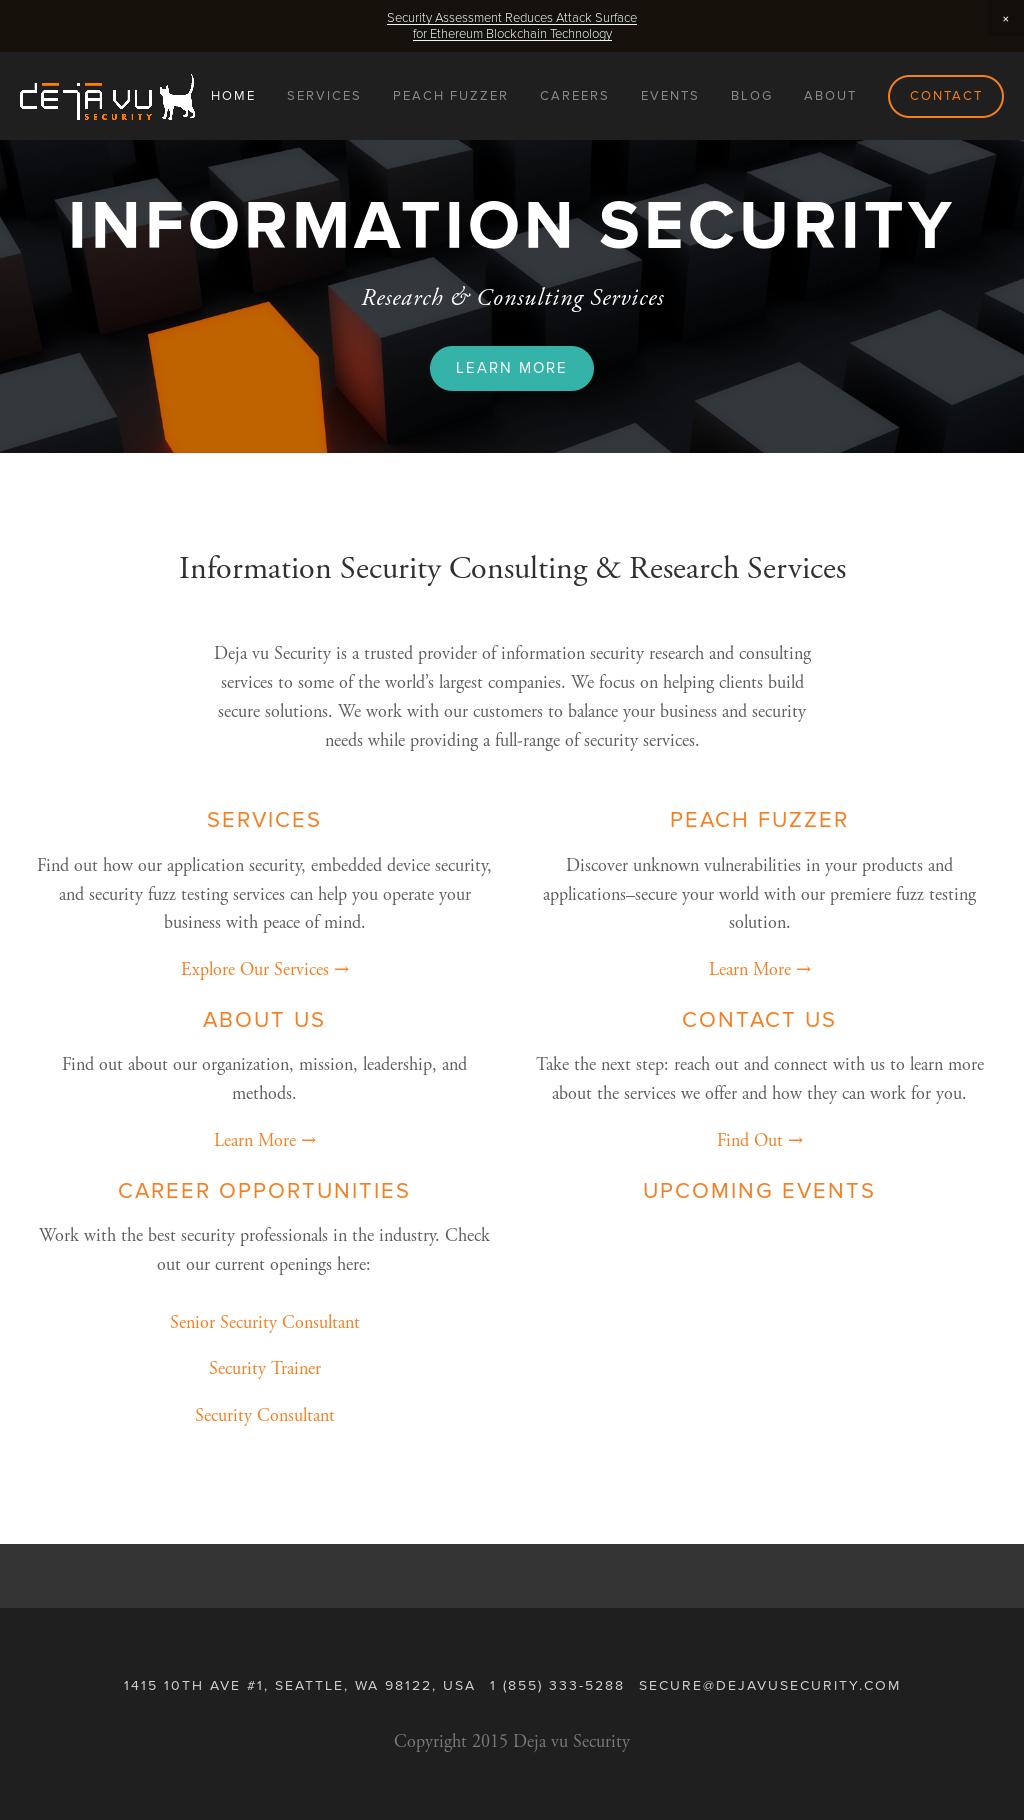 Deja vu Security Competitors, Revenue and Employees - Owler Company